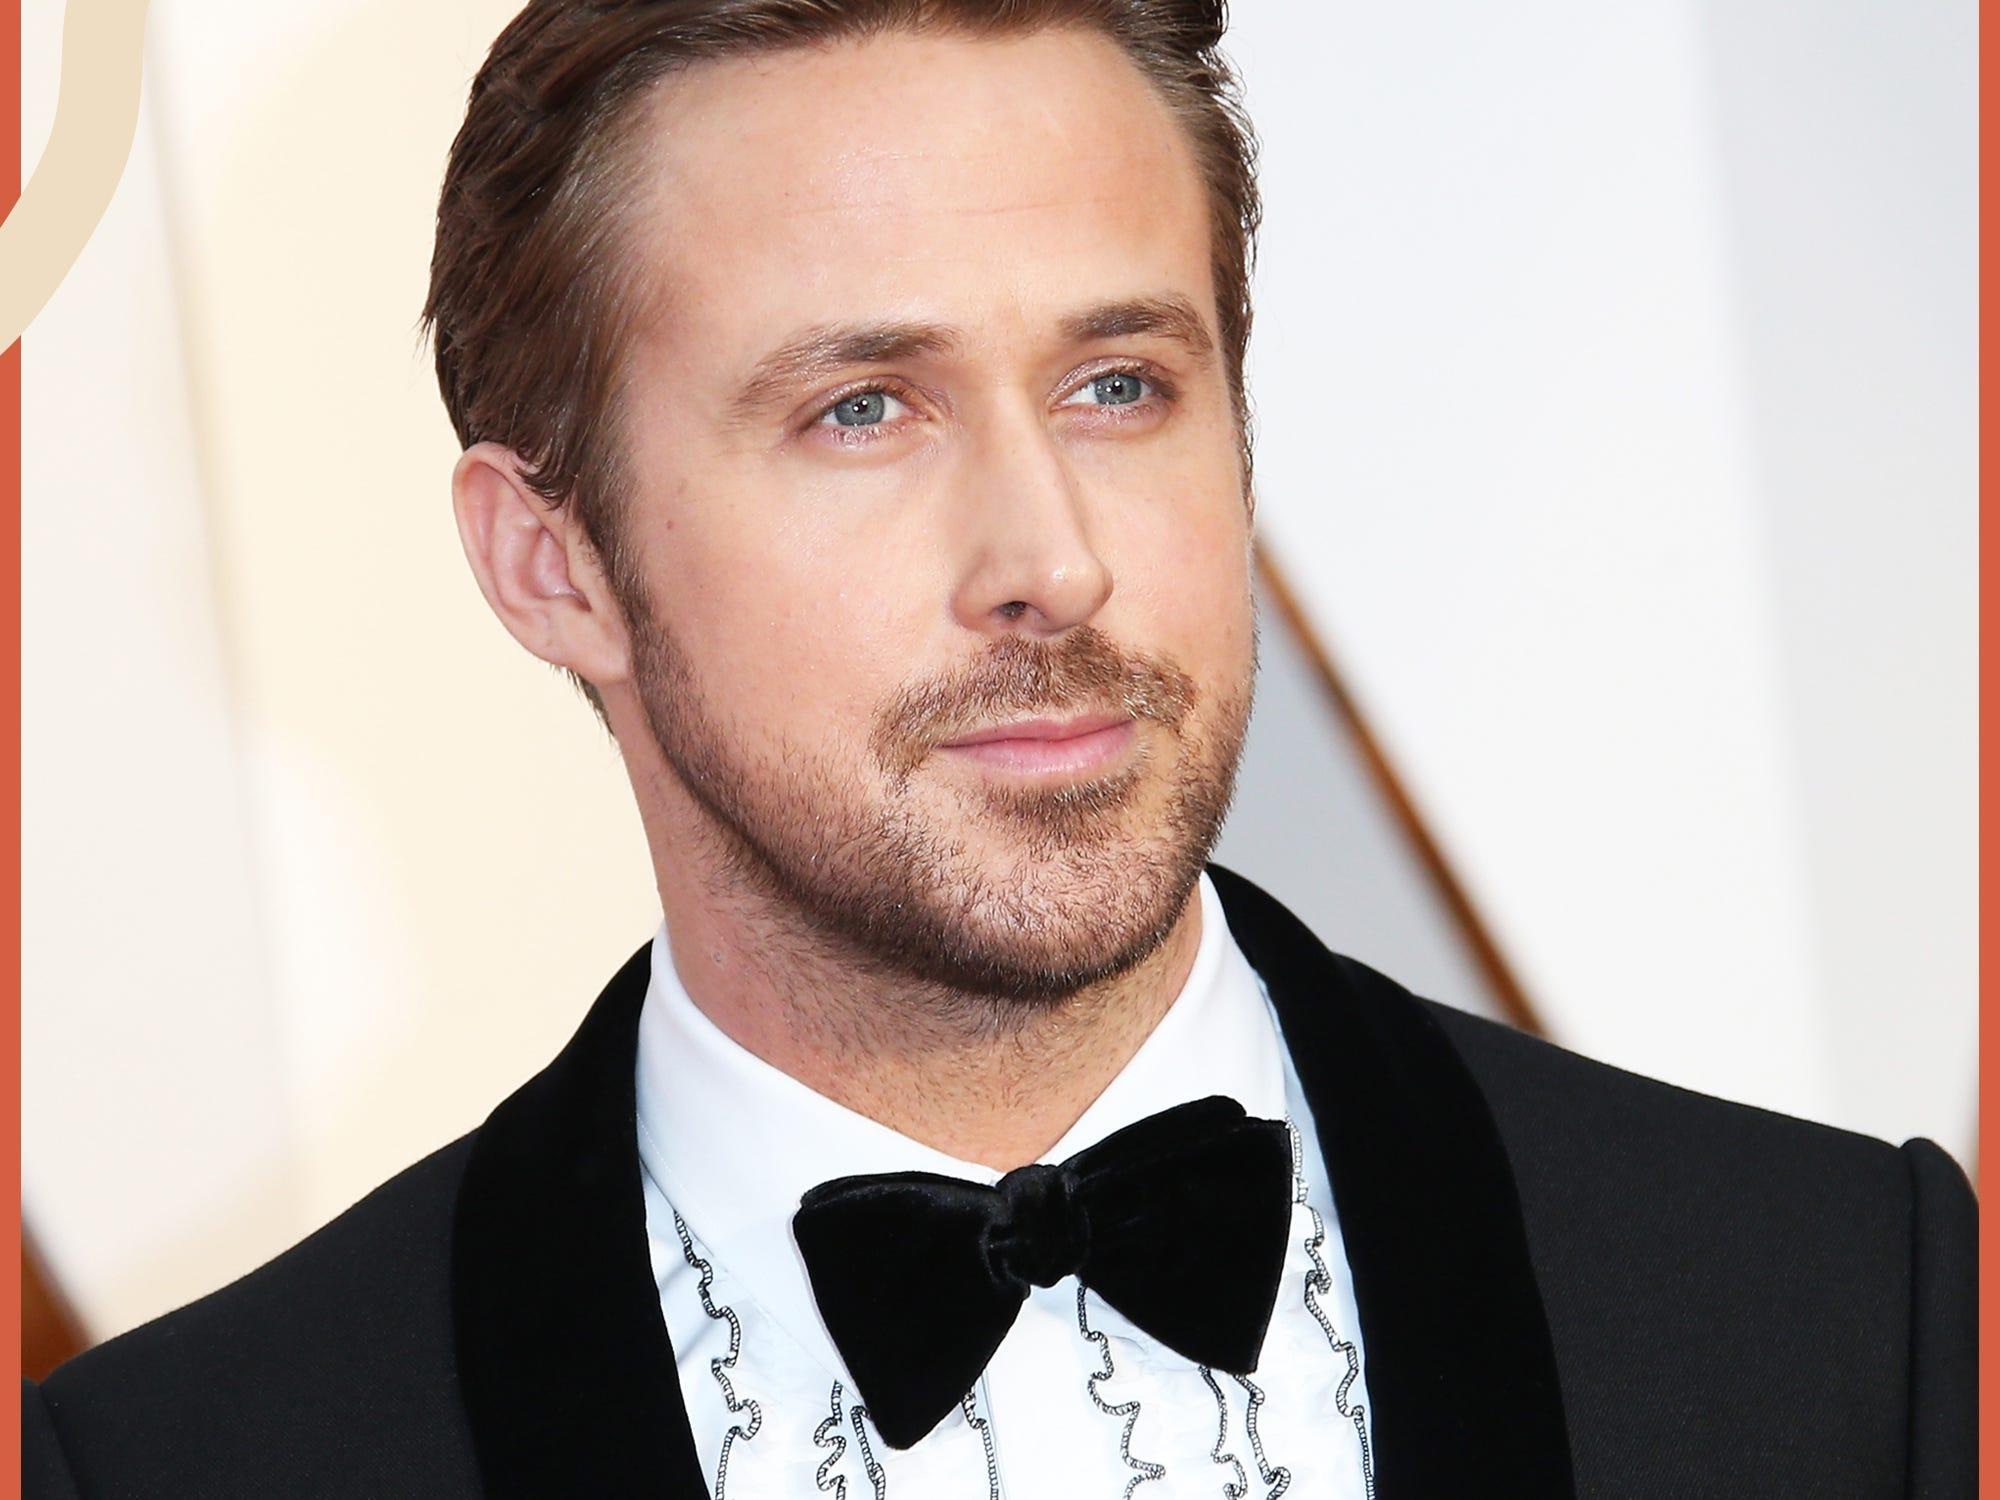 Jared Goff Looks Like Ryan Gosling Twitter Agrees